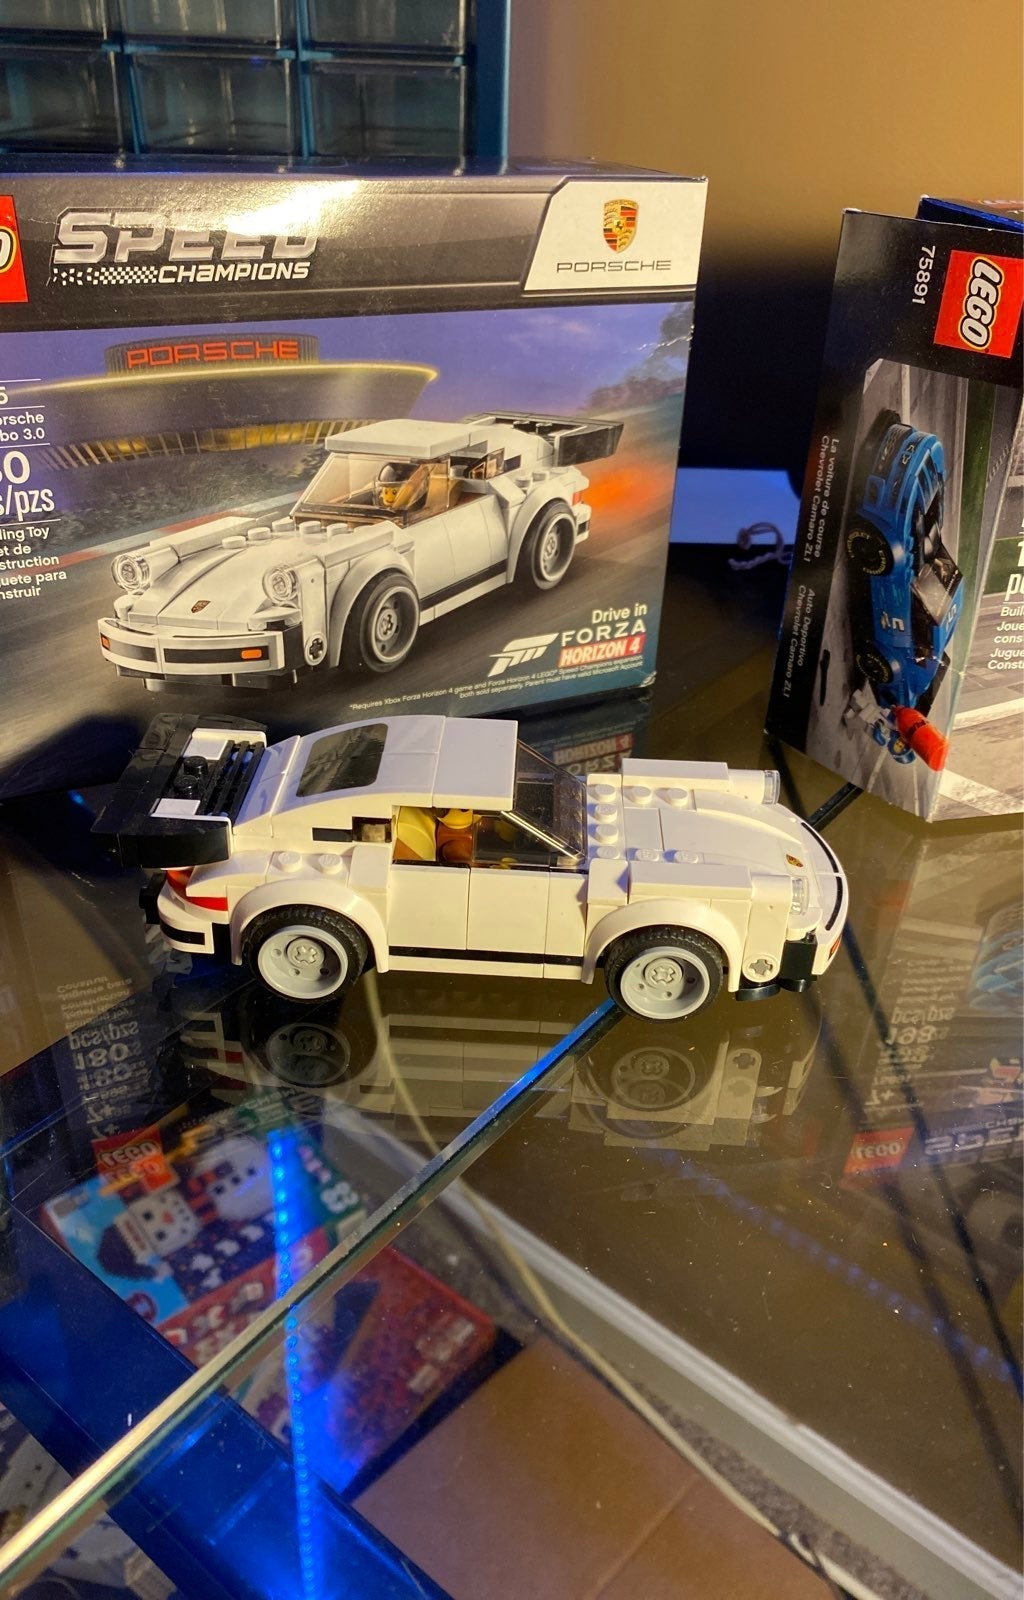 Lego speed champions cars